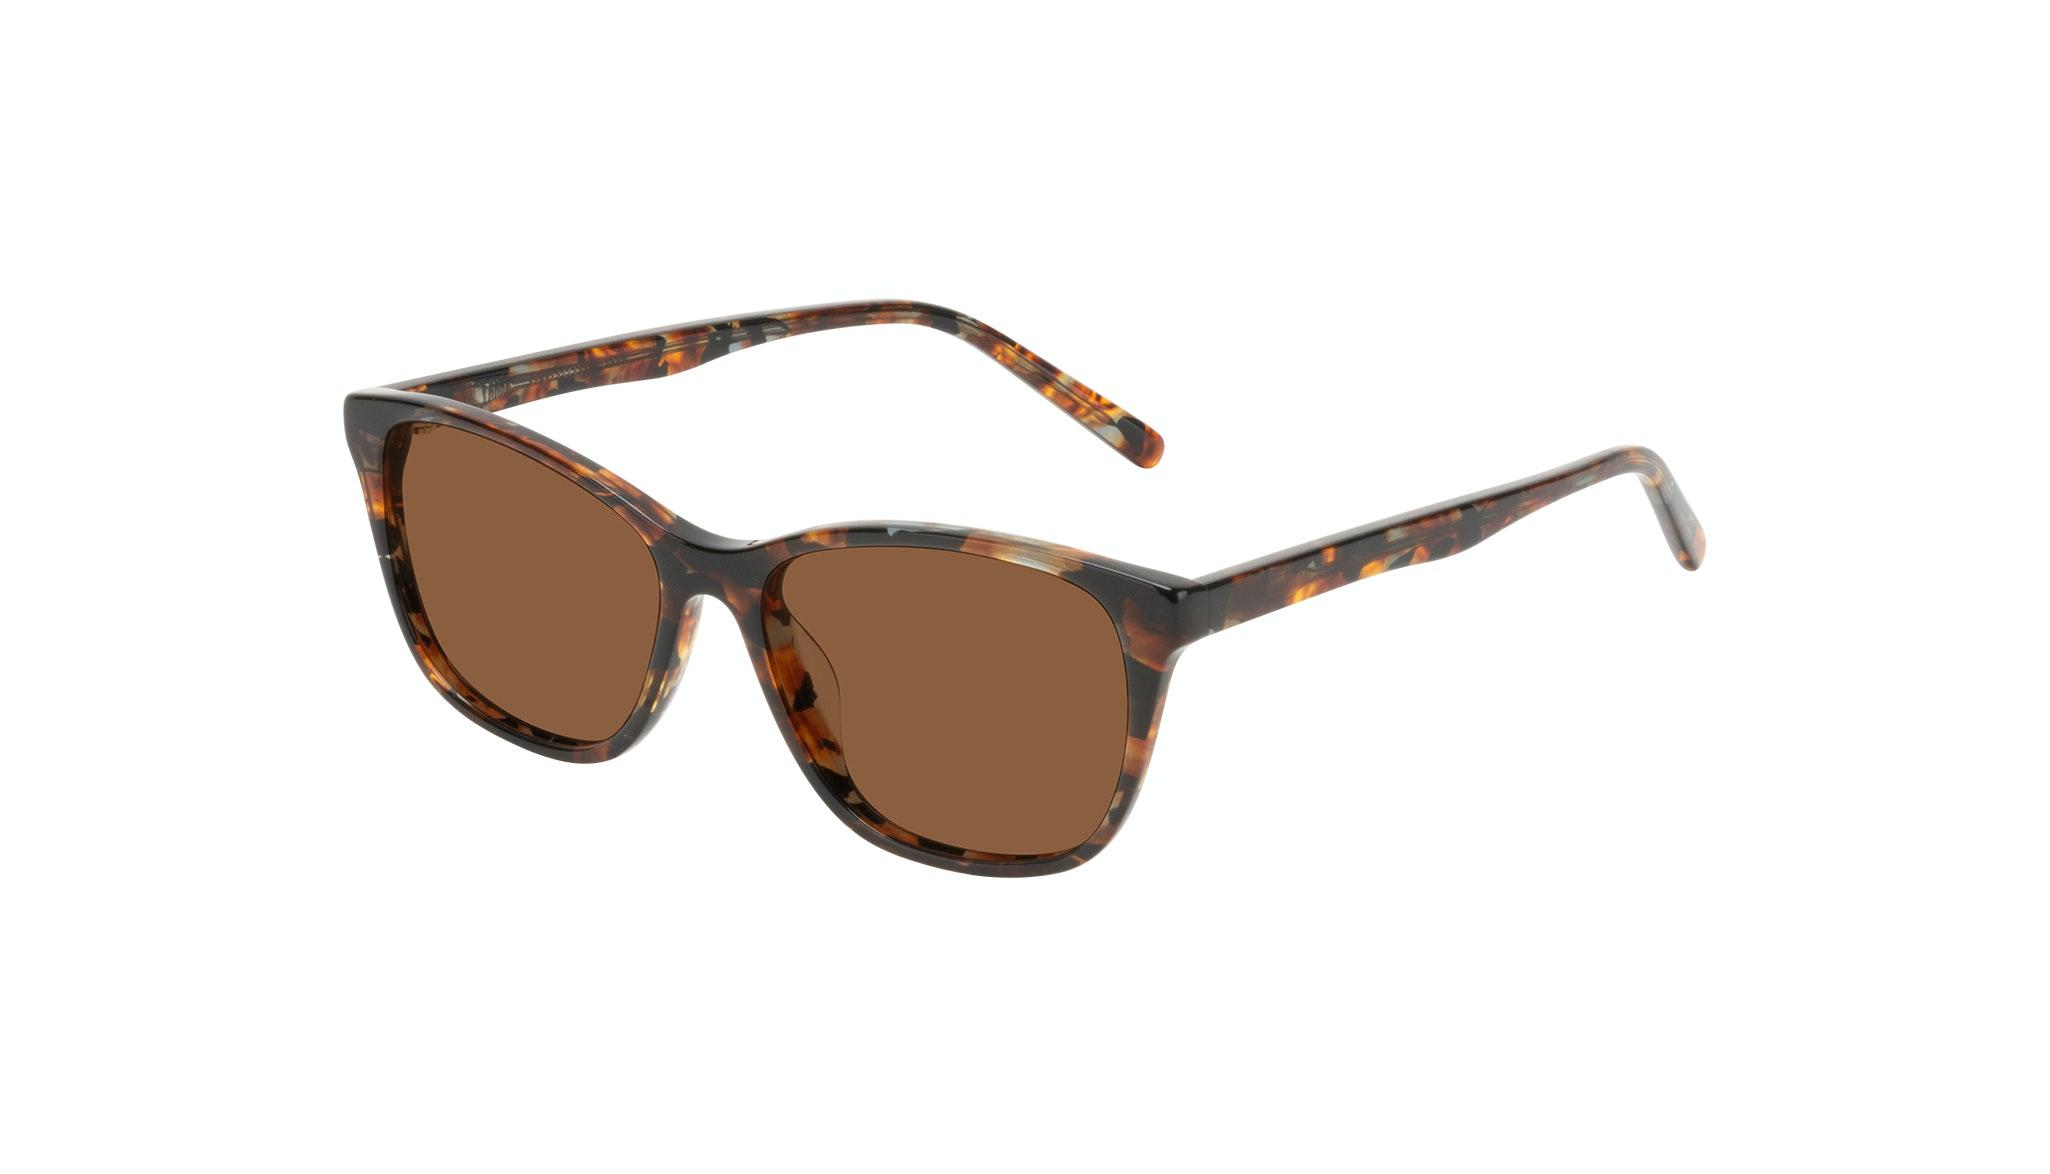 Affordable Fashion Glasses Cat Eye Sunglasses Women Myrtle Petite Mahogany Tilt